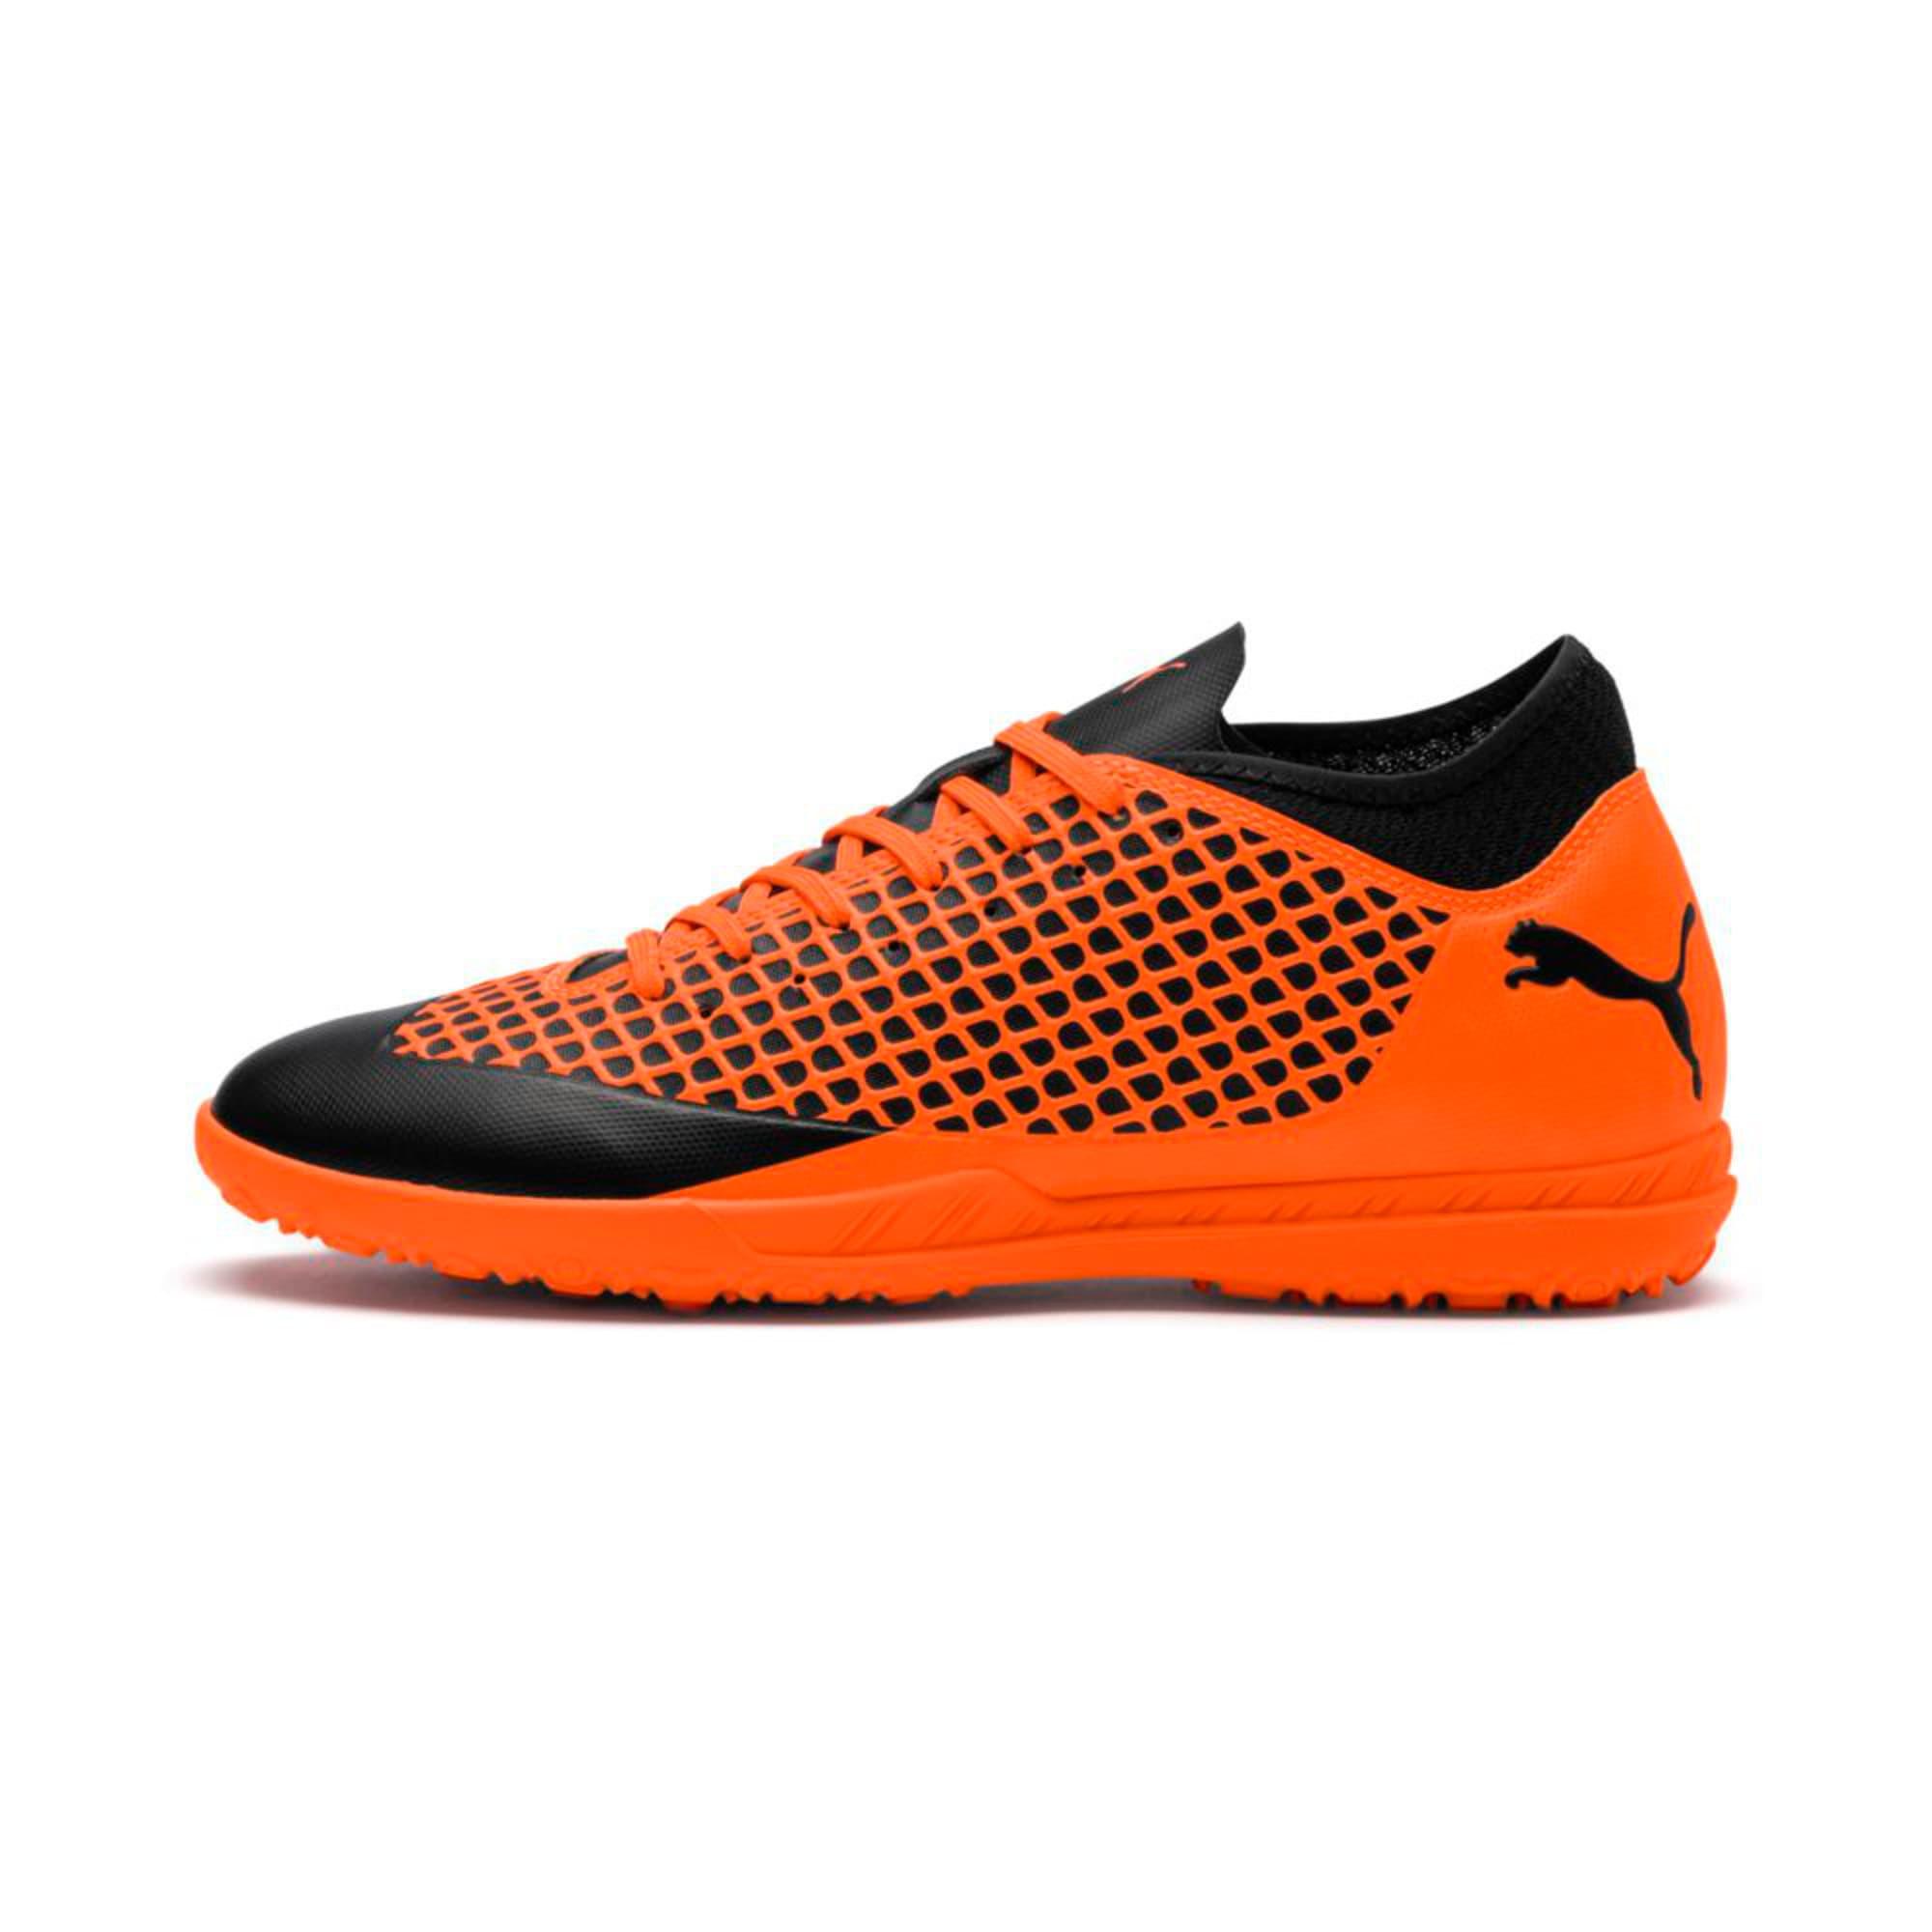 Thumbnail 1 of FUTURE 2.4 TT Men's Football Boots, Puma Black-Shocking Orange, medium-IND